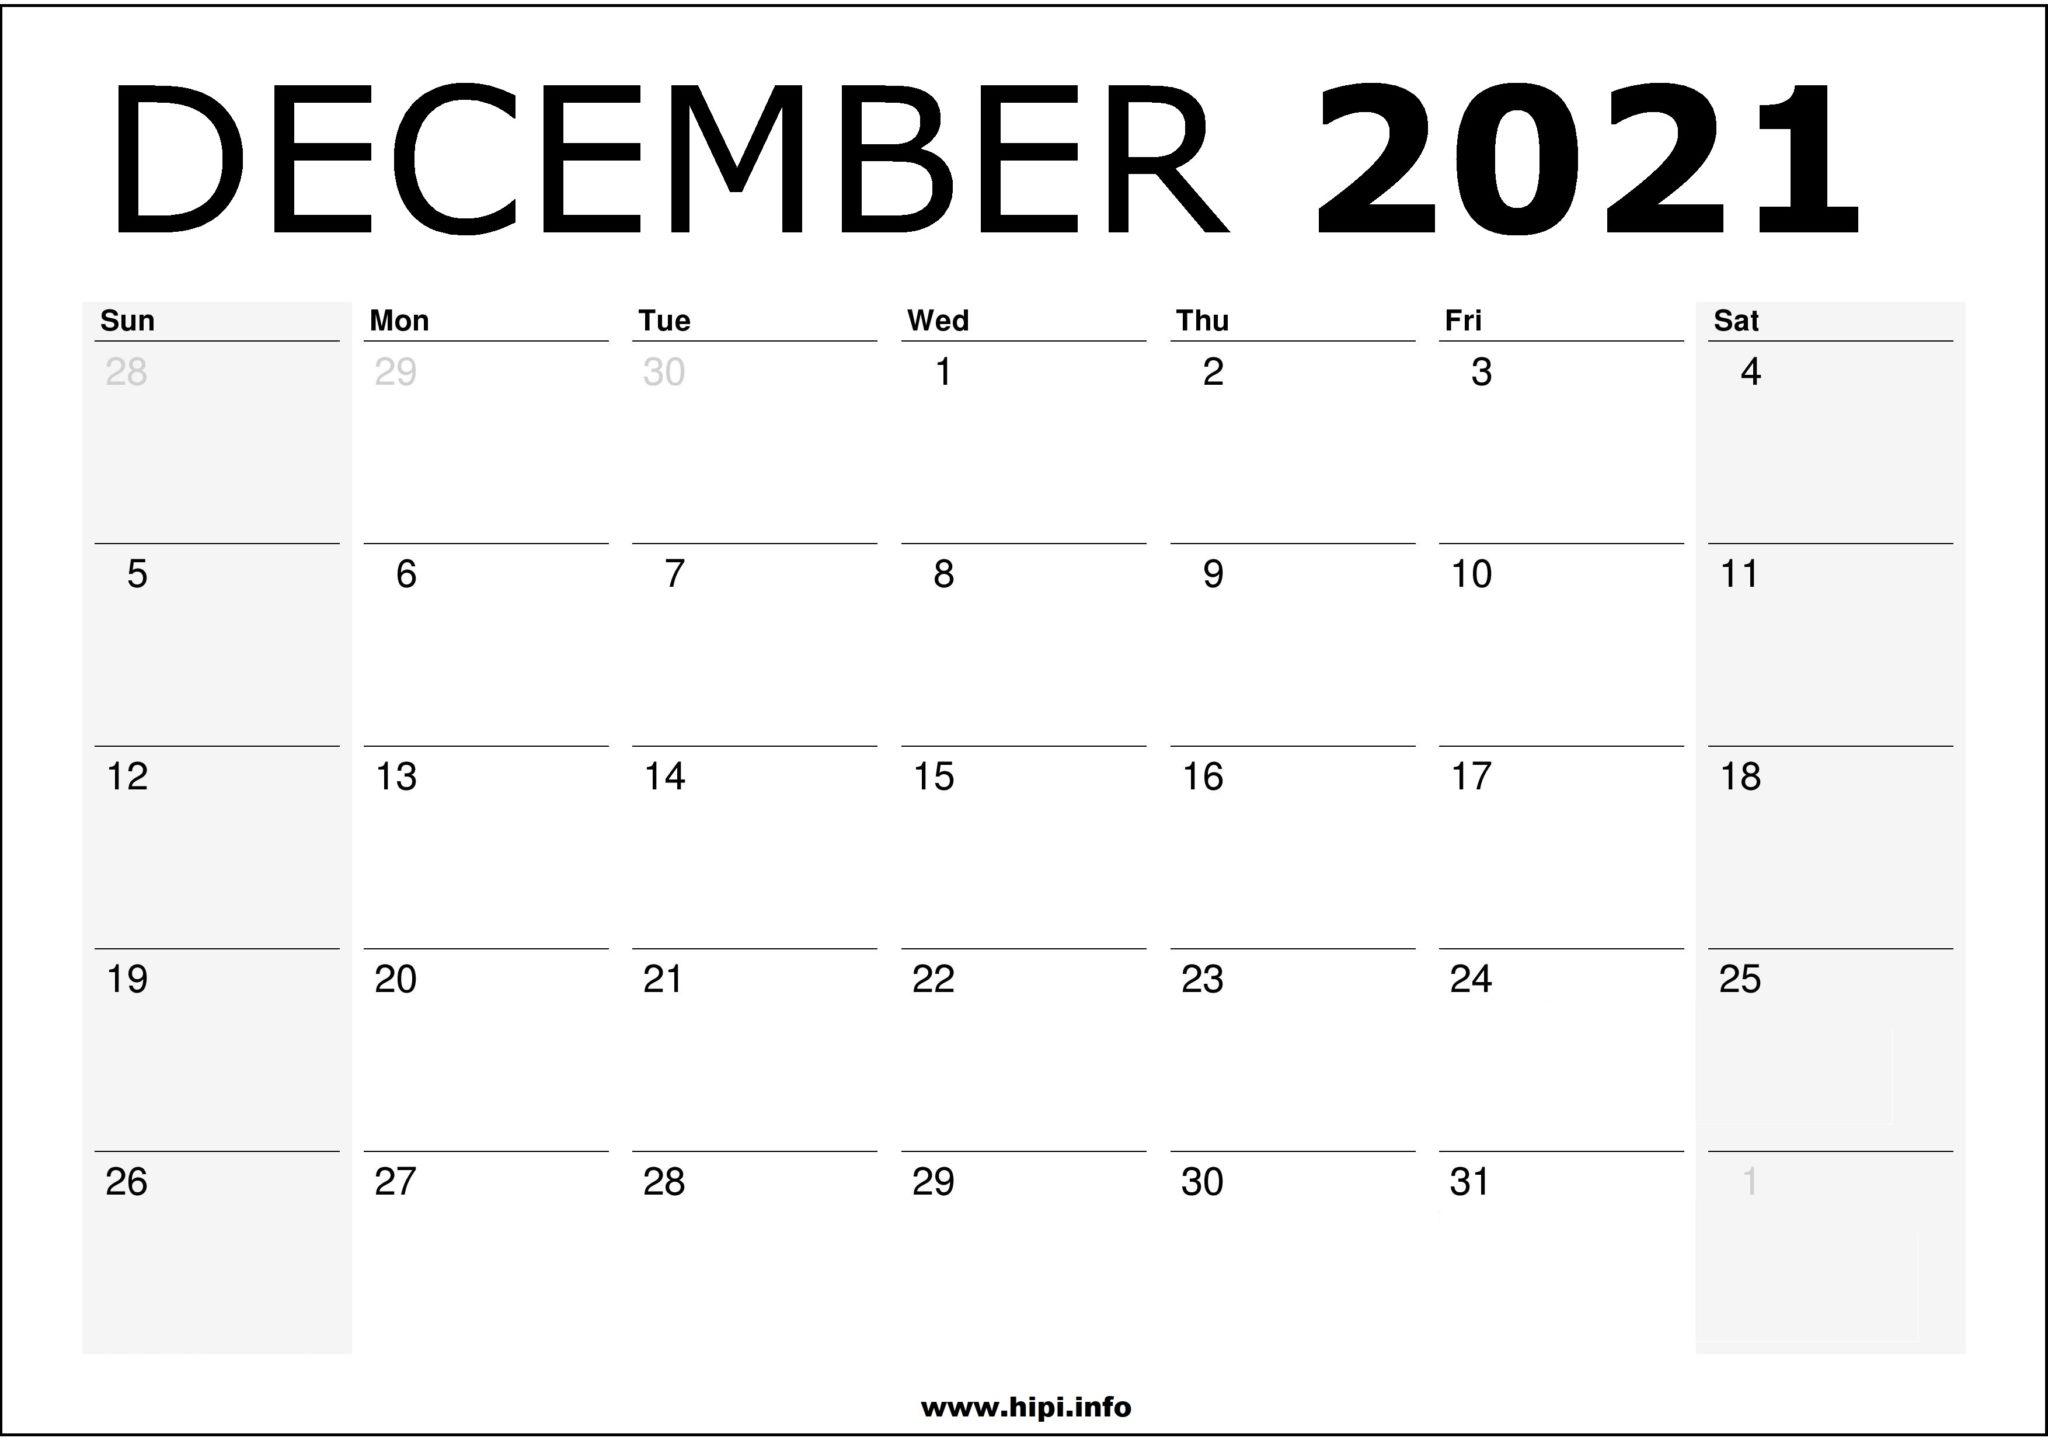 December 2021 Calendar Printable - Monthly Calendar Free Download - Hipi | Calendars December 2021 Calendar Printable